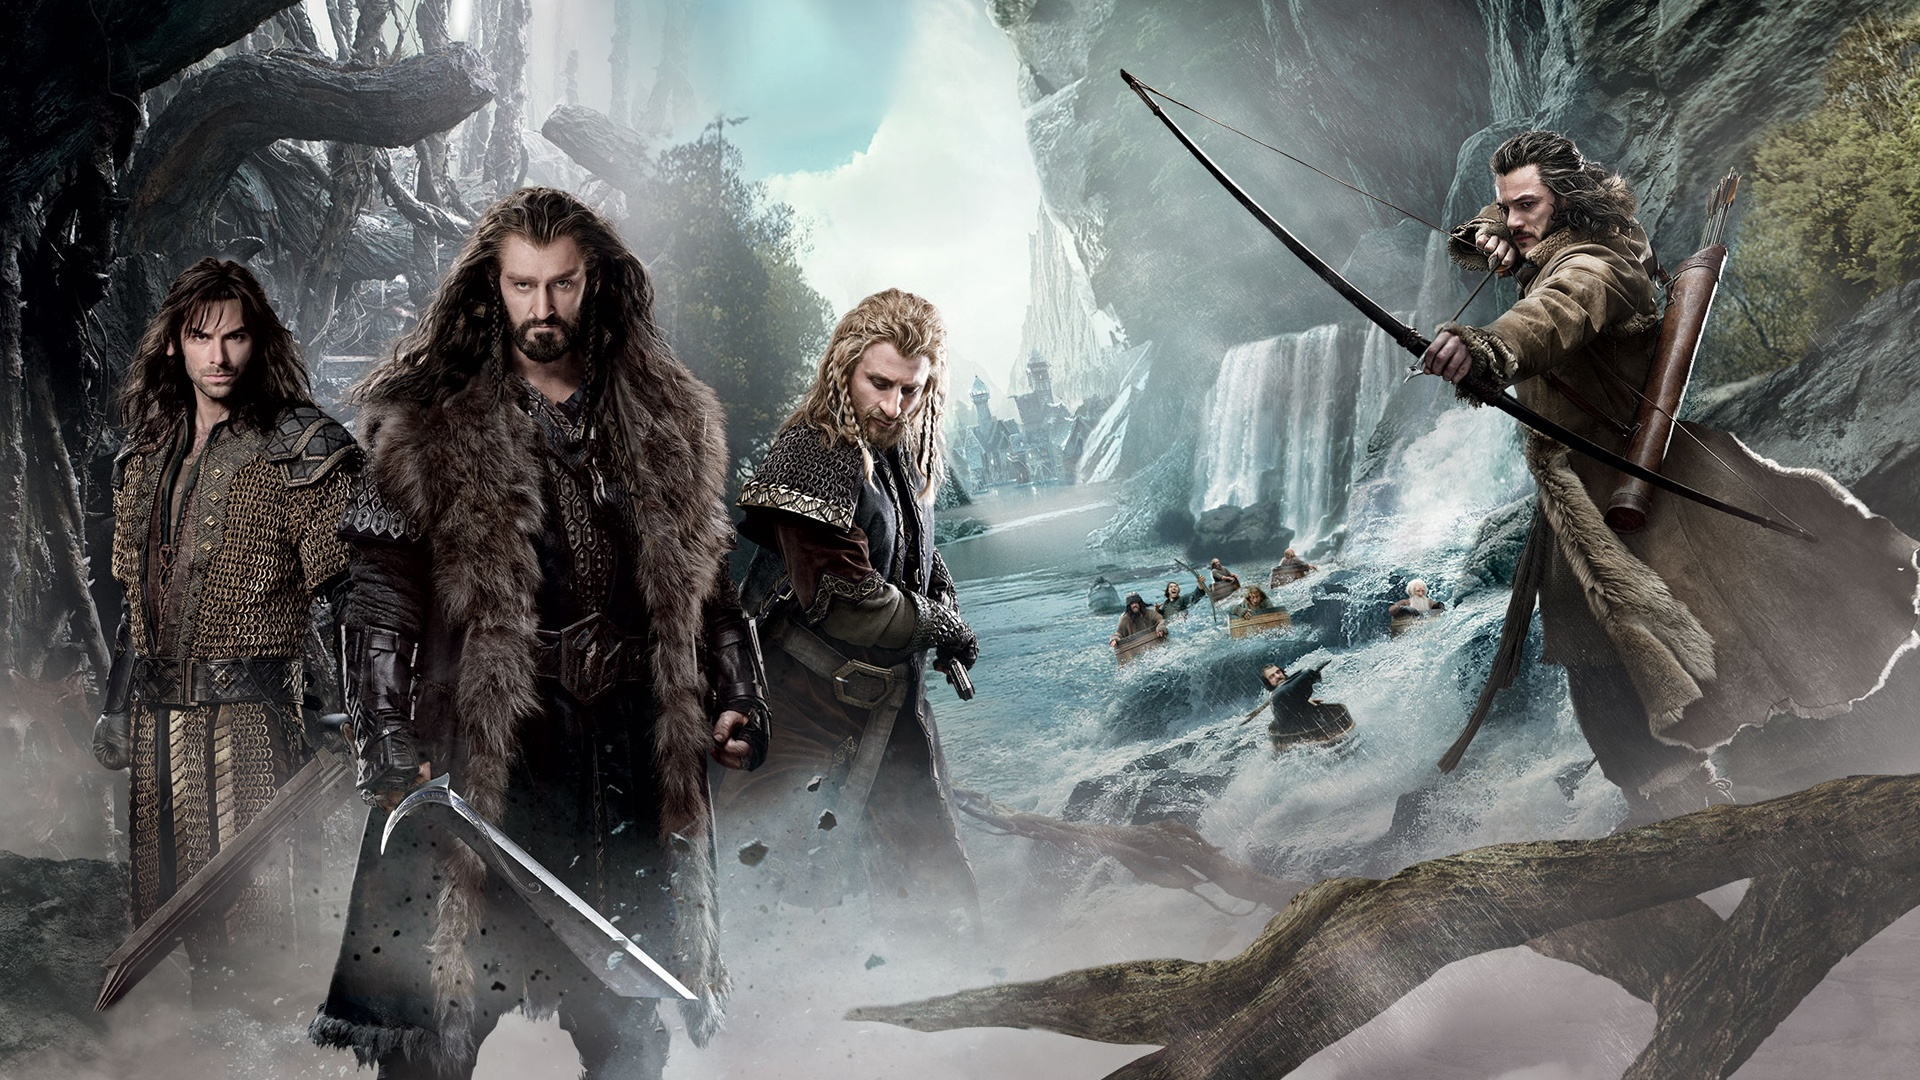 The-Hobbit-2-Movie